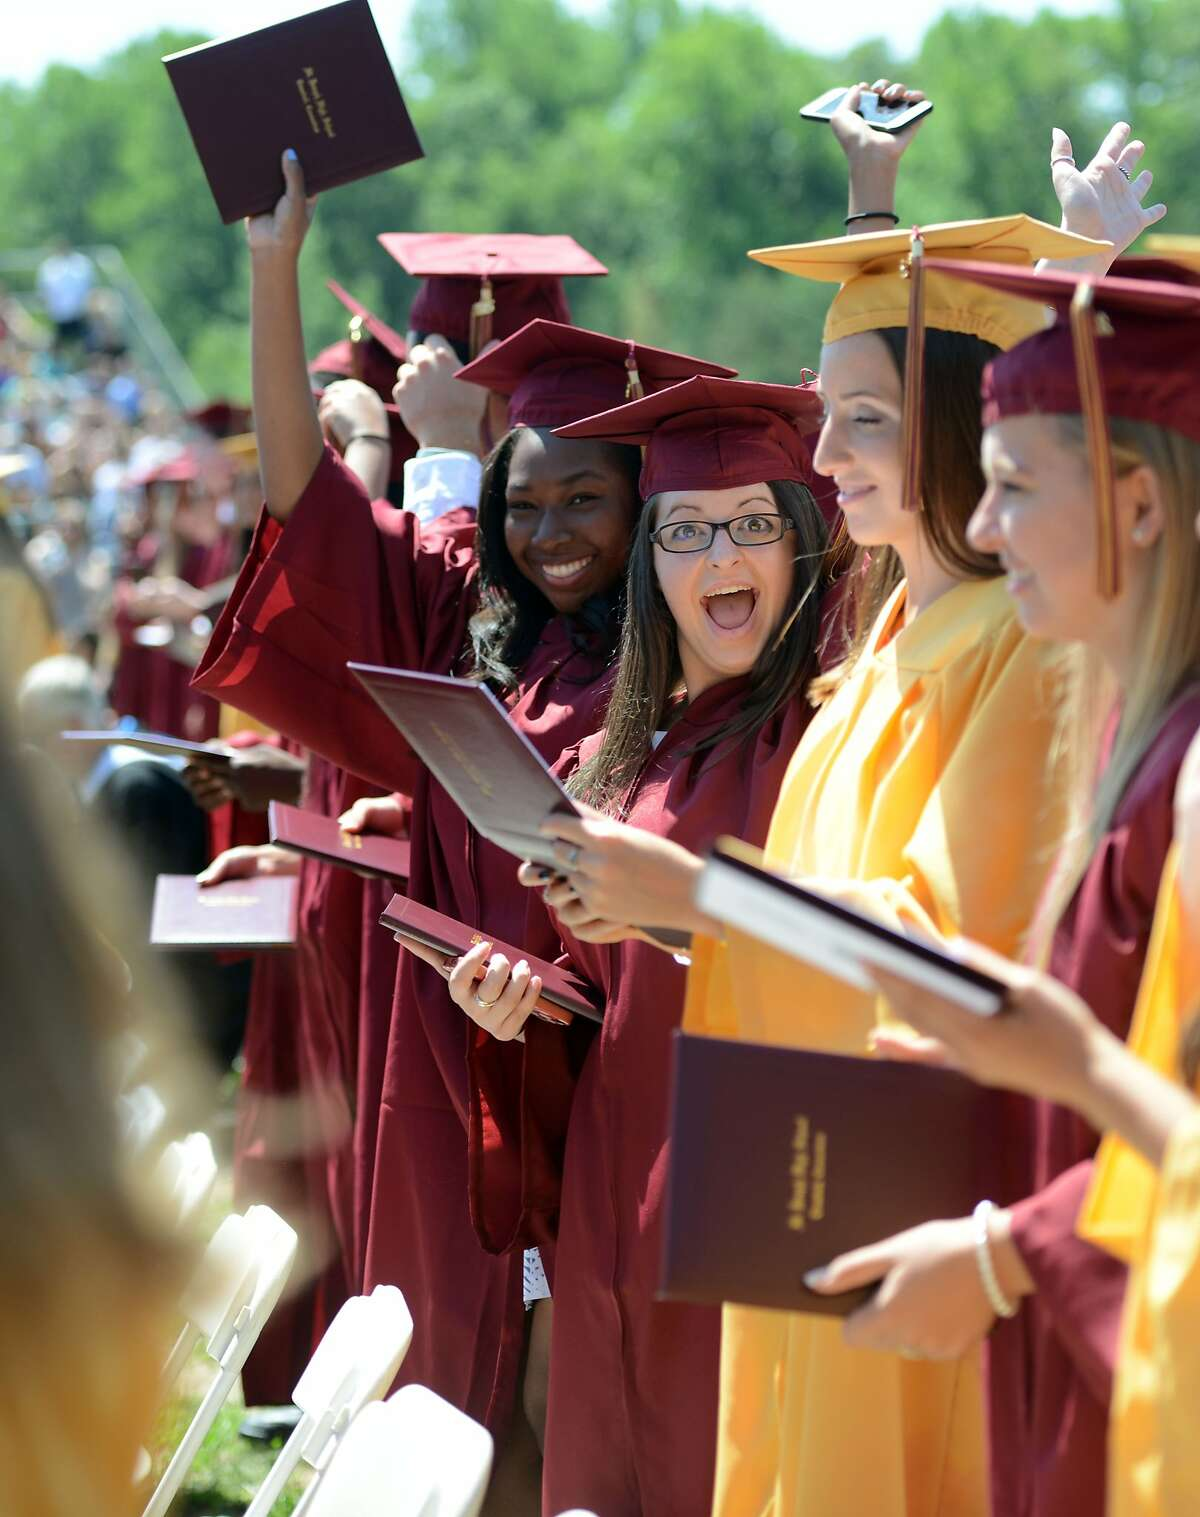 51. St. Joseph High School, Trumbull Academics: C+Student Culture & Diversity: B-(Rankings out of 64 total schools. Source: Niche )